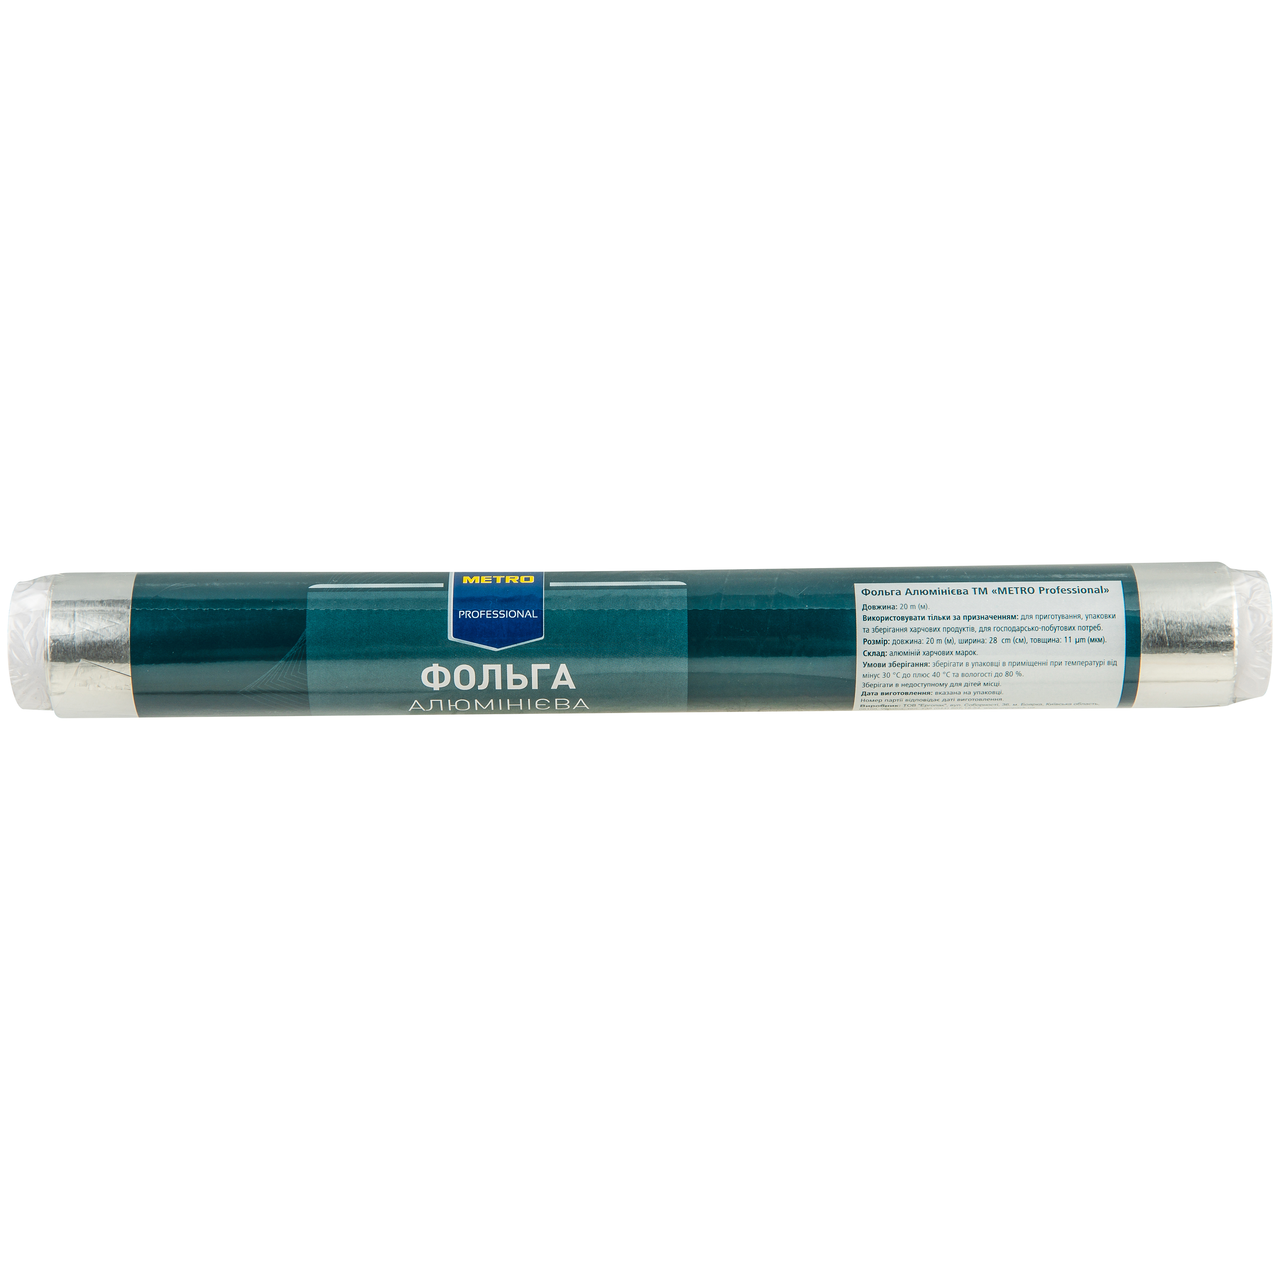 Фольга Metro Professional алюмінієва 20м 1шт